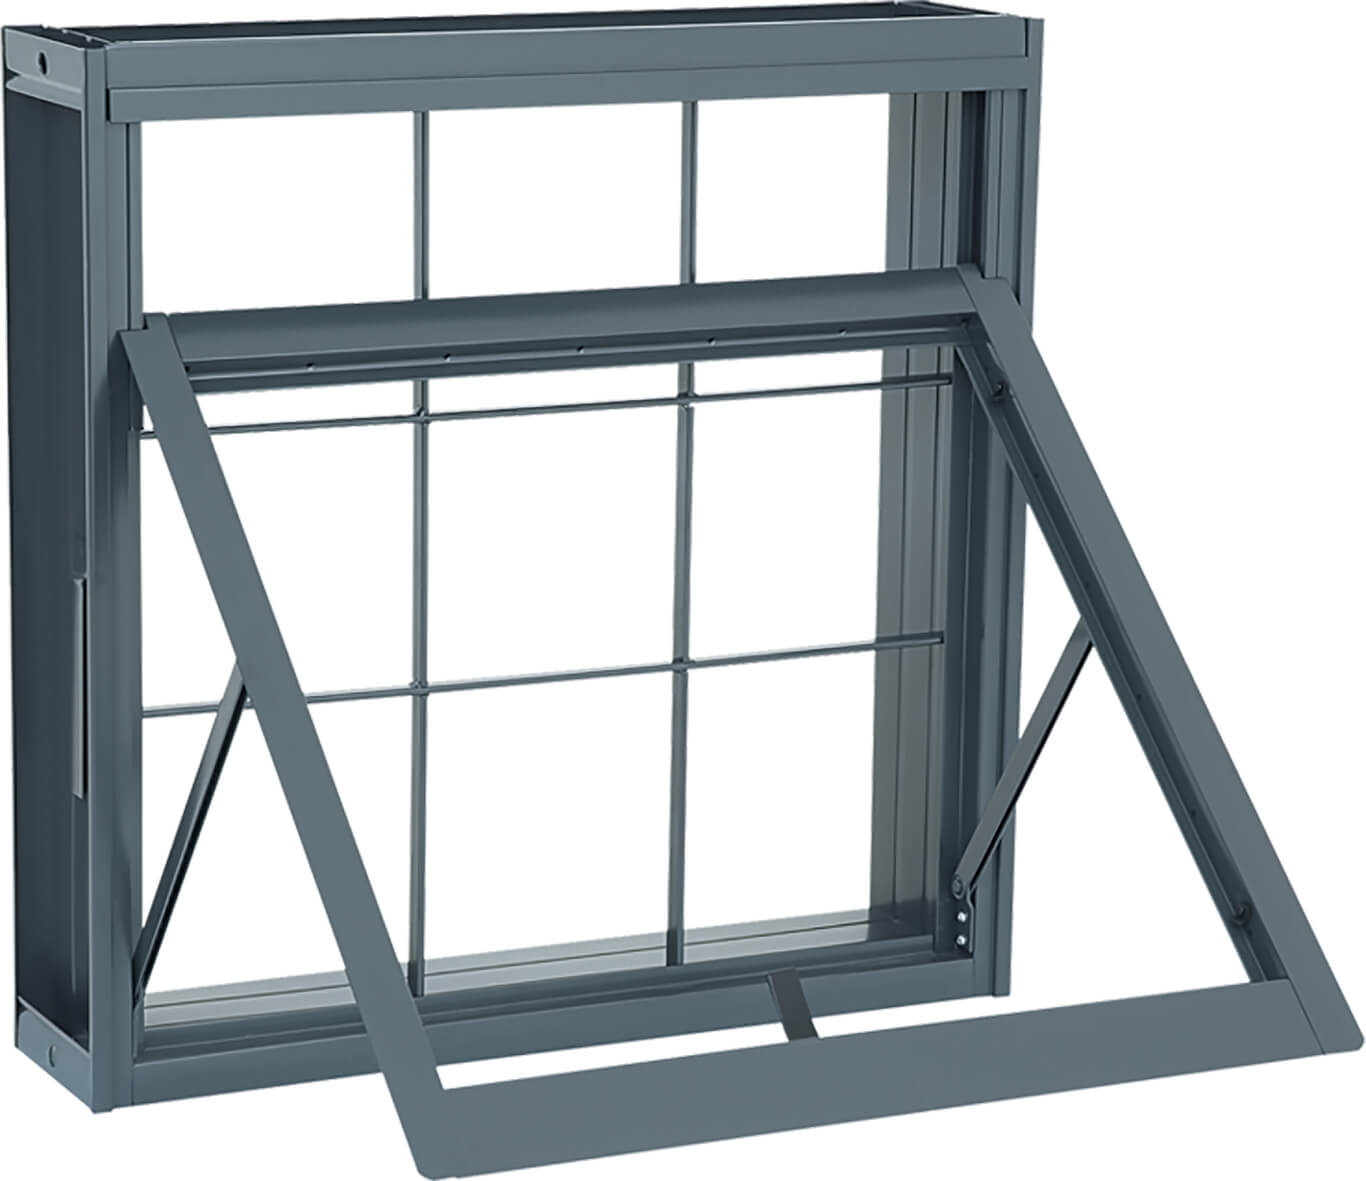 Silenfort Janela Maxim-Ar - 0.60x0.80x08 Sasazaki Ref. 64.34.102-2